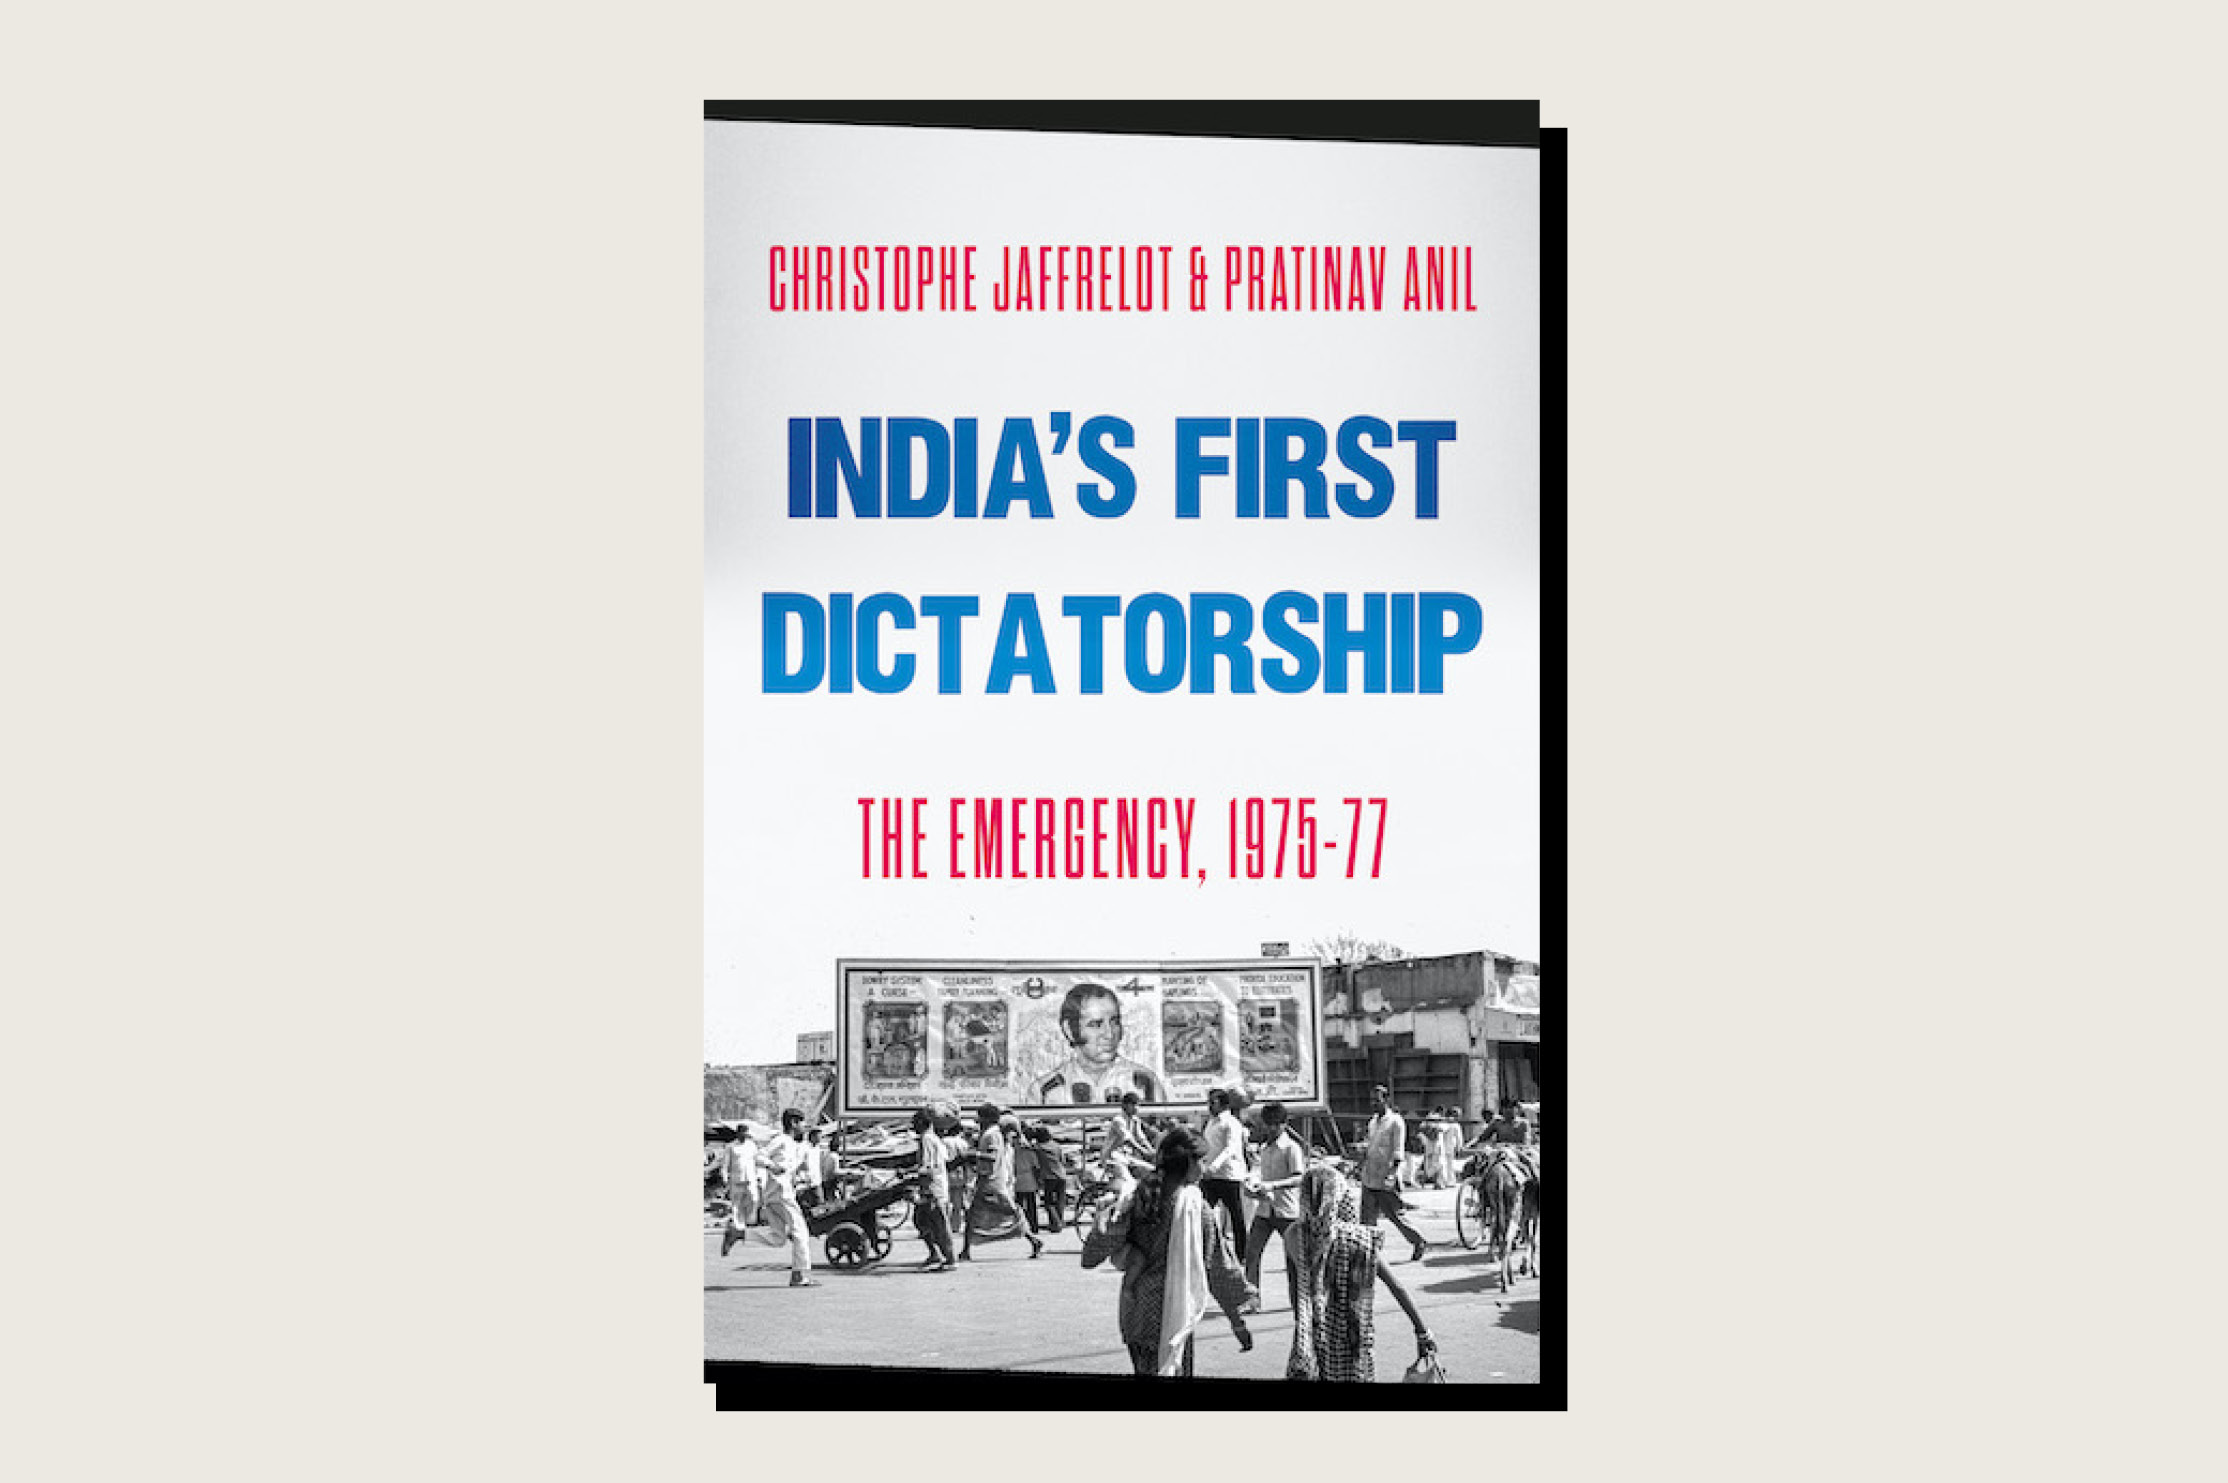 <em>India's First Dictatorship: The Emergency, 1975-77</em>, Christophe Jaffrelot and Pratinav Anil, Oxford University Press, 600 pp., .95, April 2021.